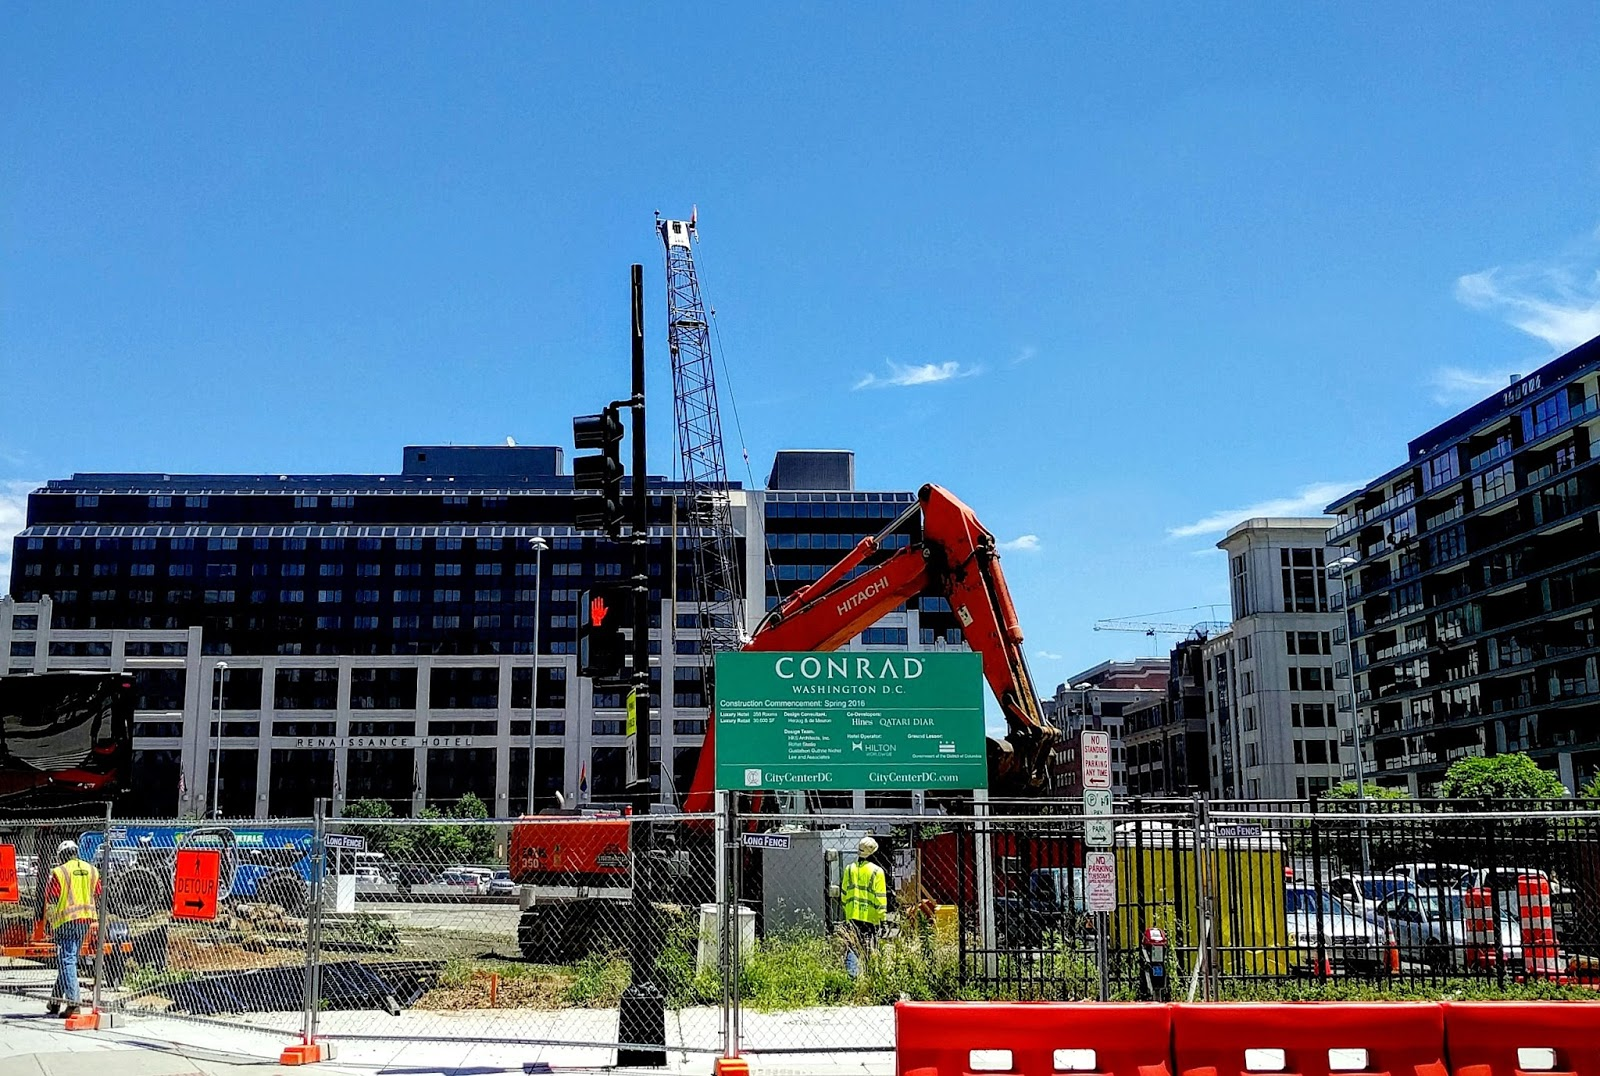 The X2 370 Key Conrad Hotel Breaks Ground